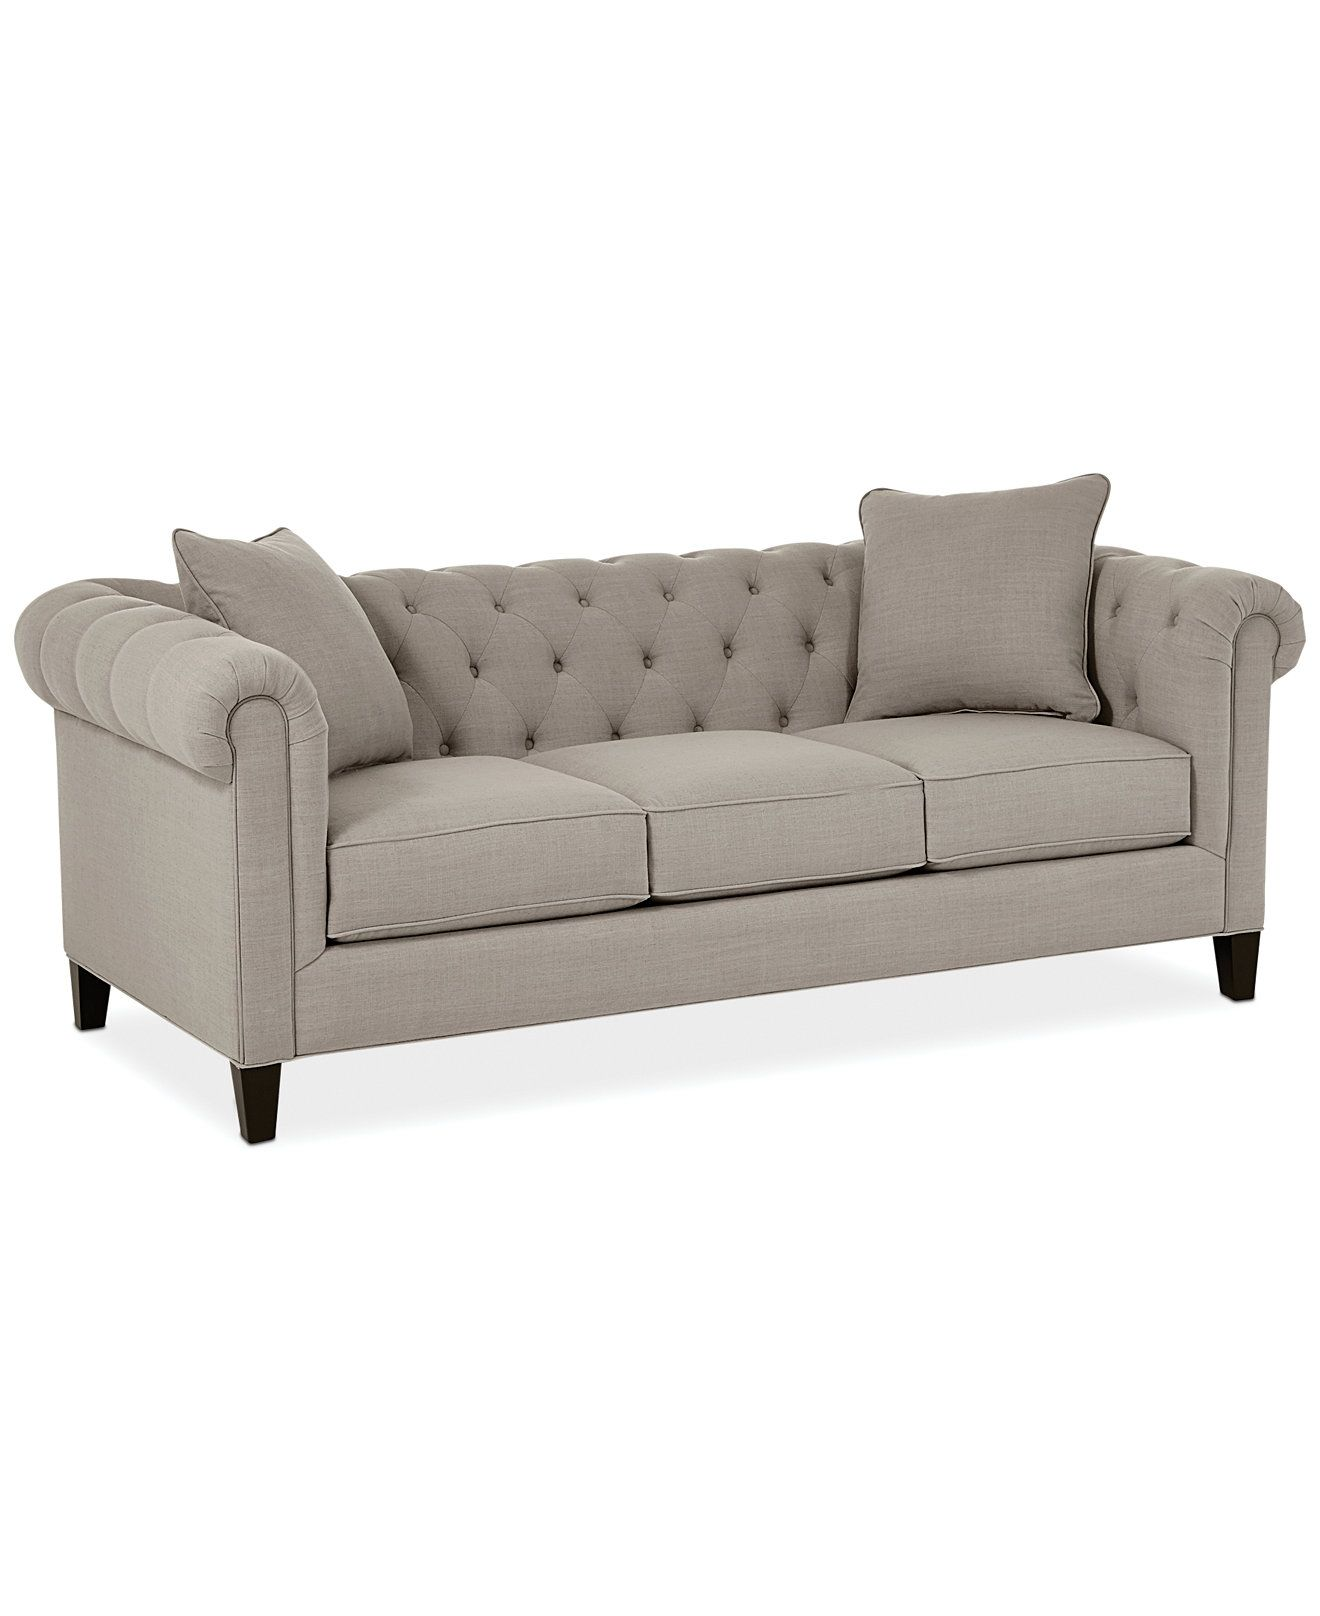 Macys Com Furniture: Living Room Furniture